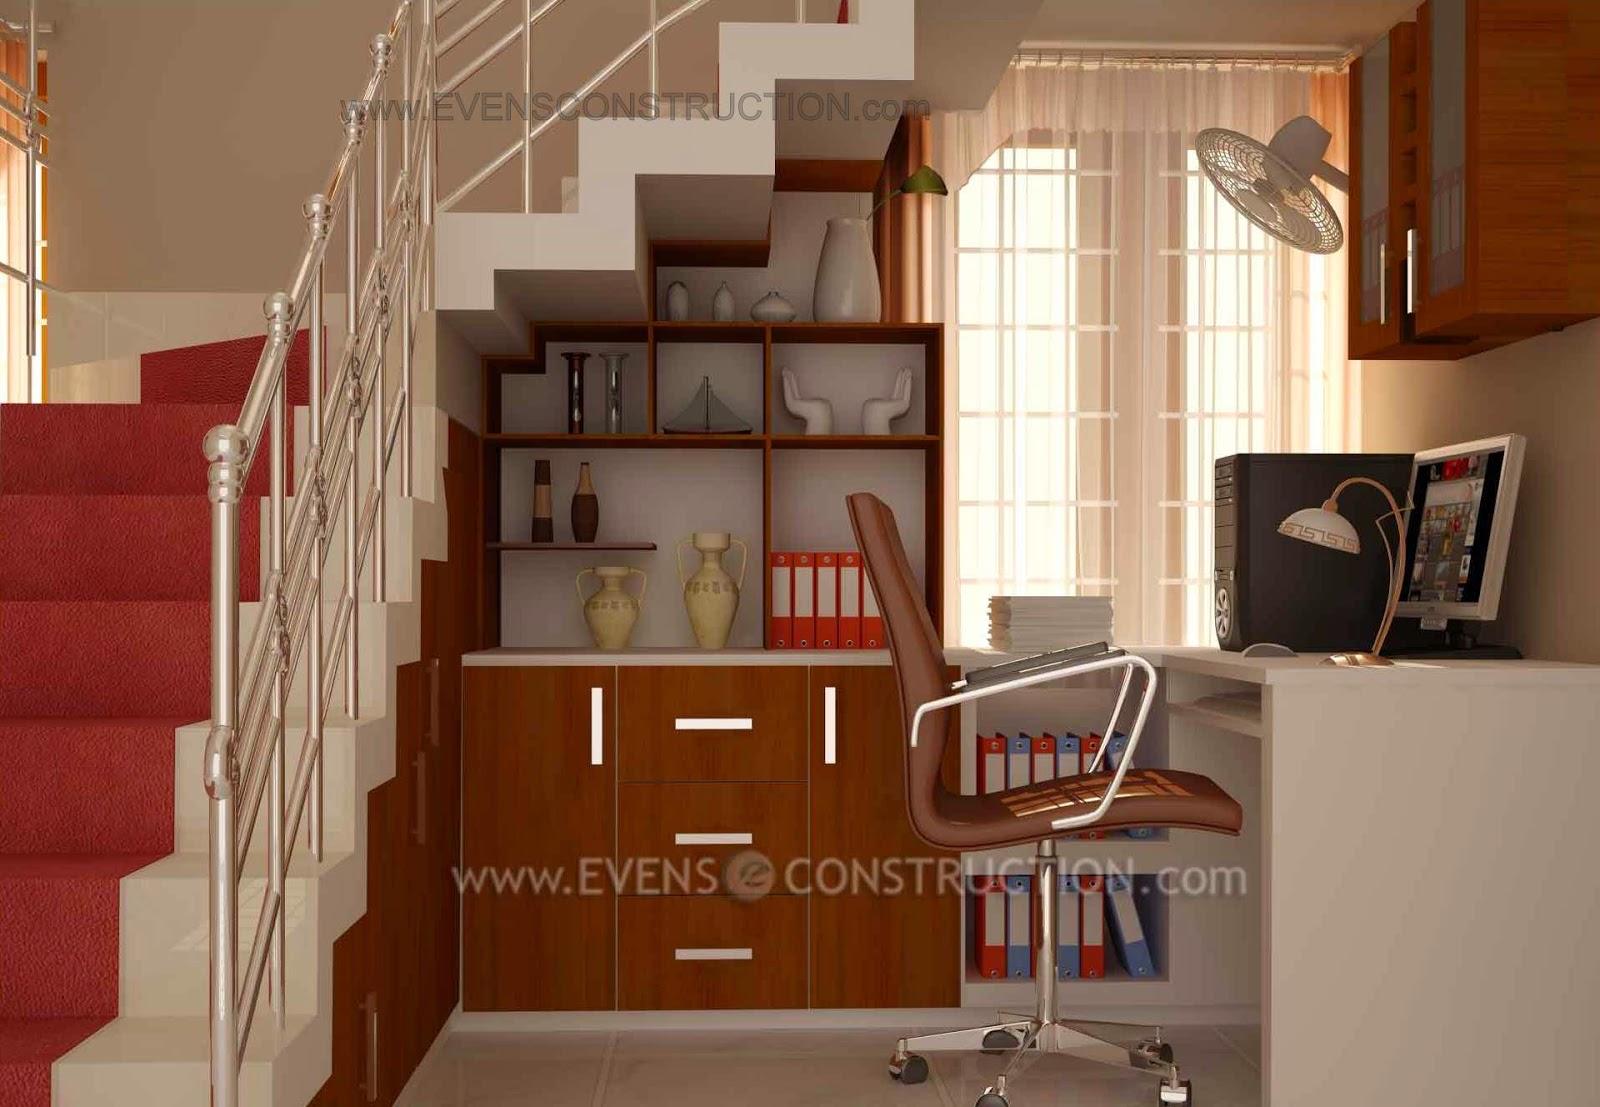 Crockery Shelf Under Stairs